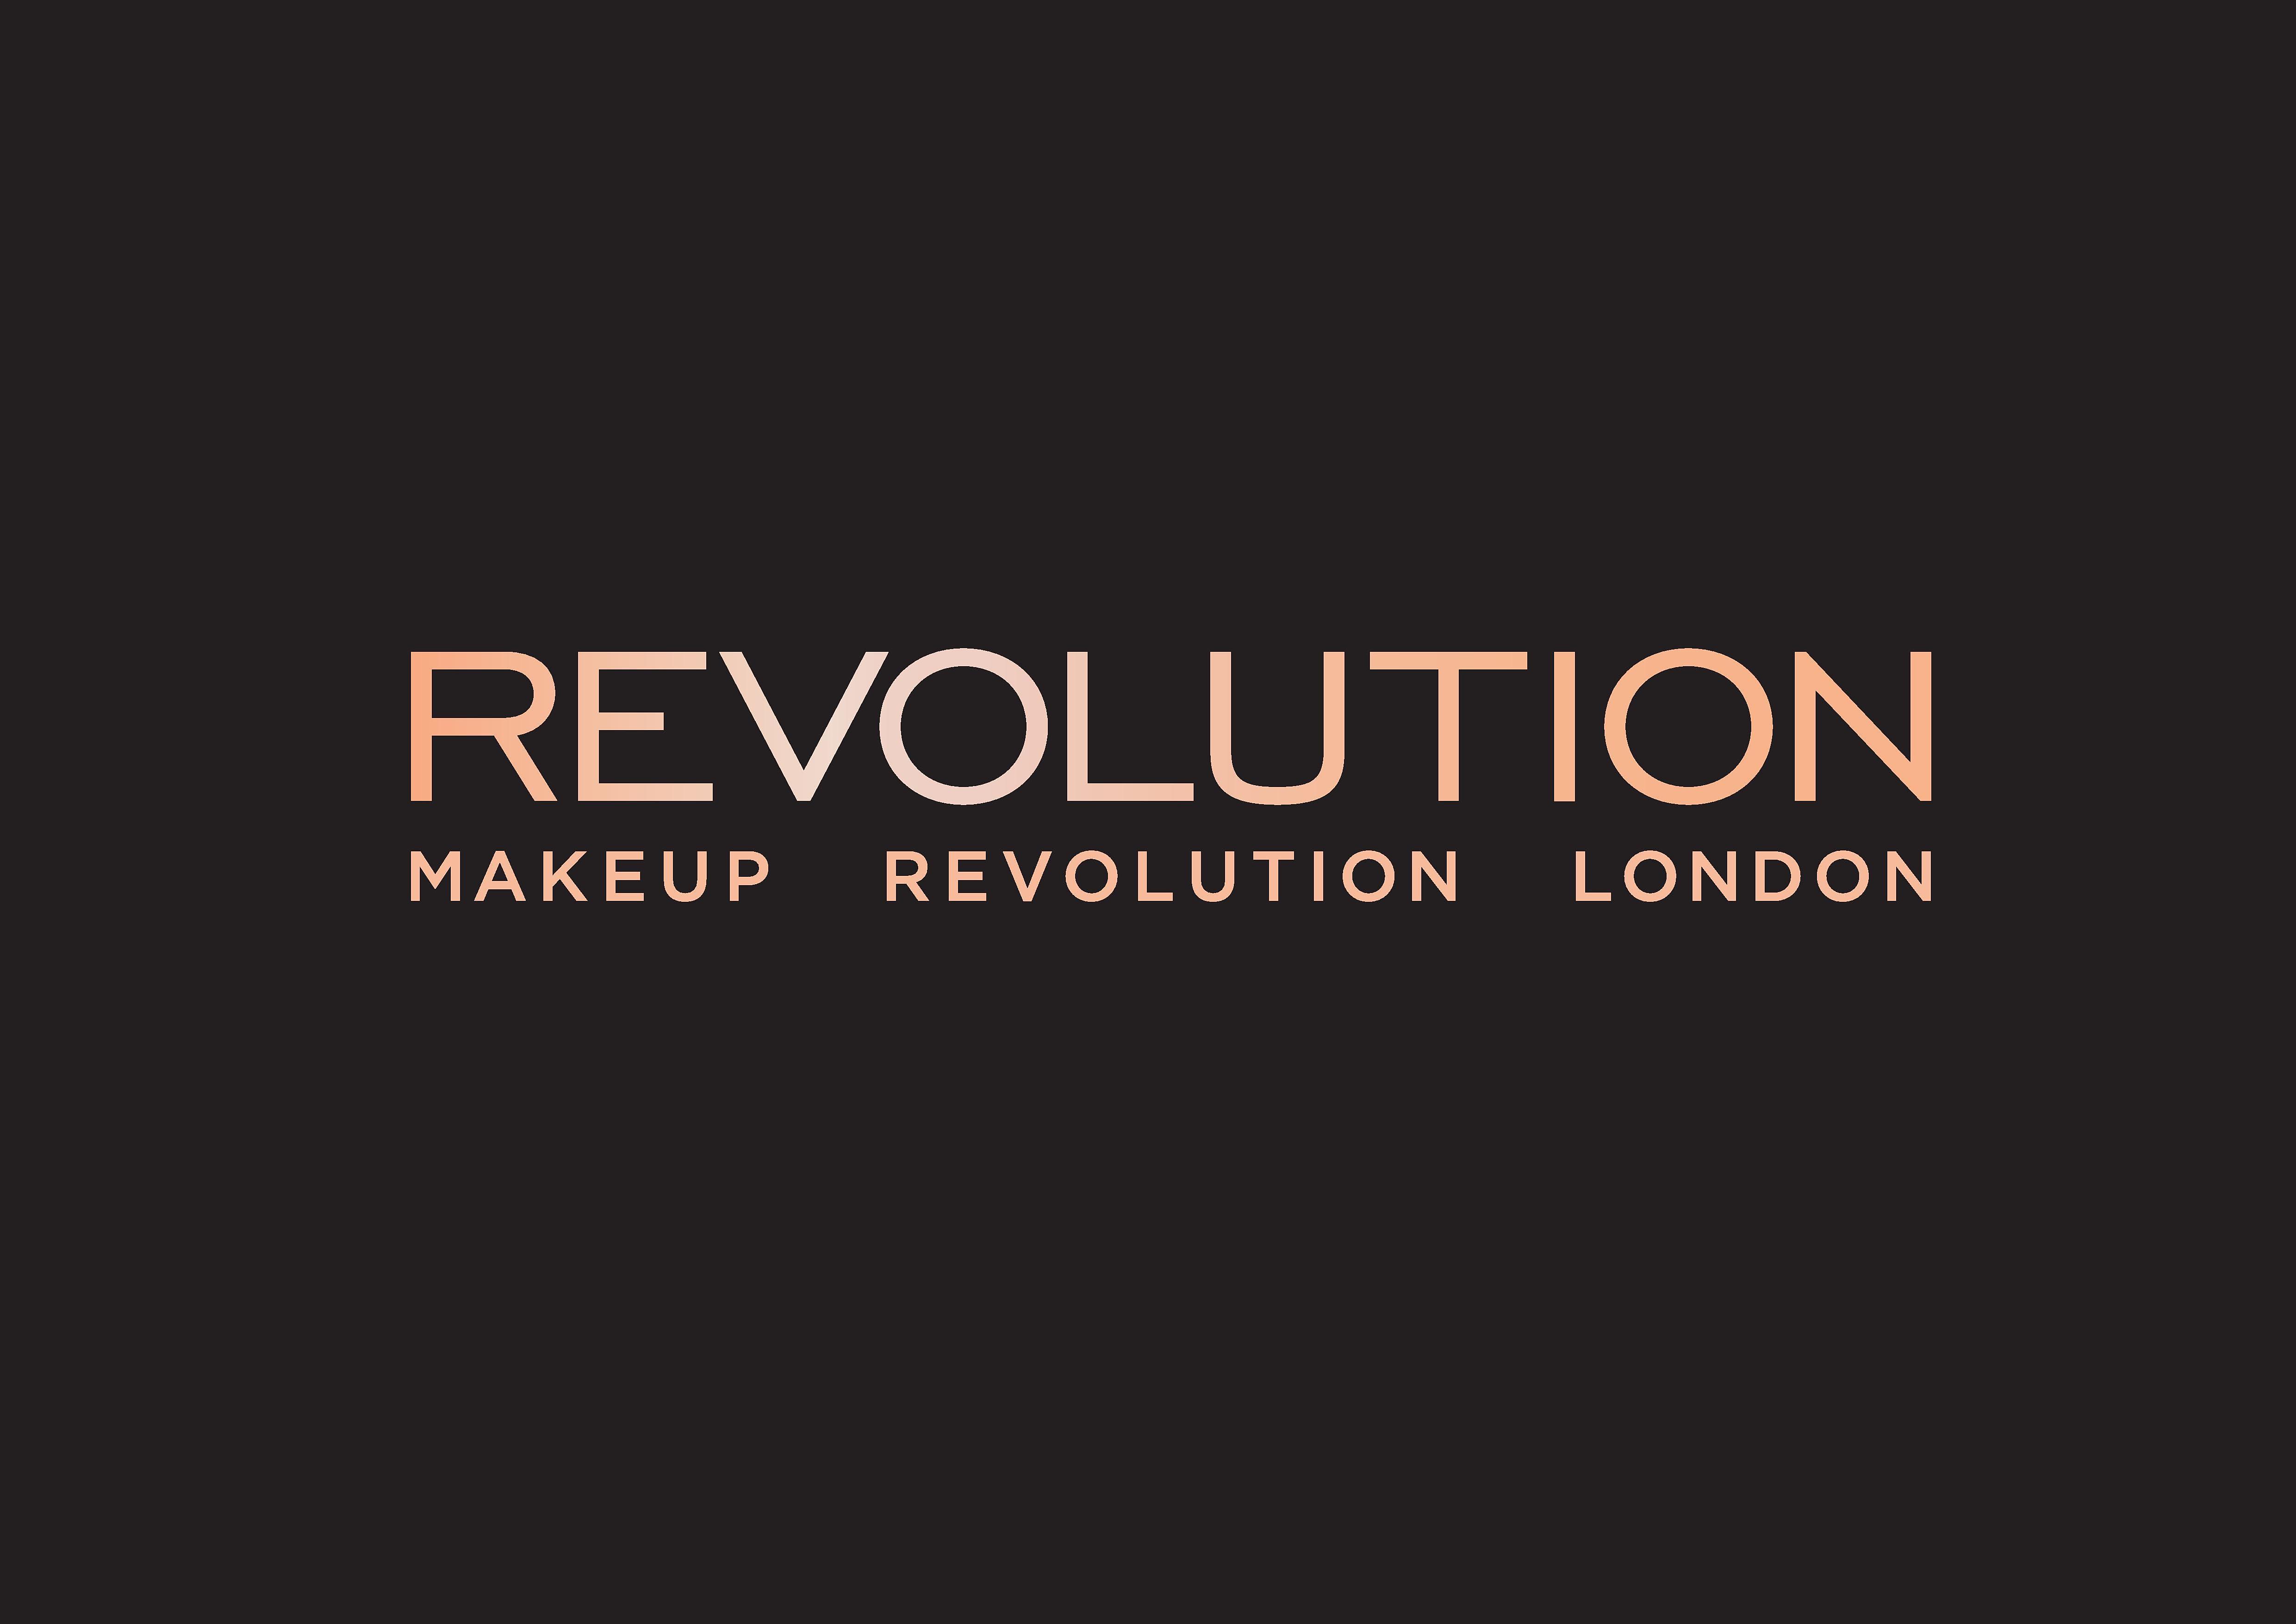 Professional Make Up Artists School Of Makeup Artistry